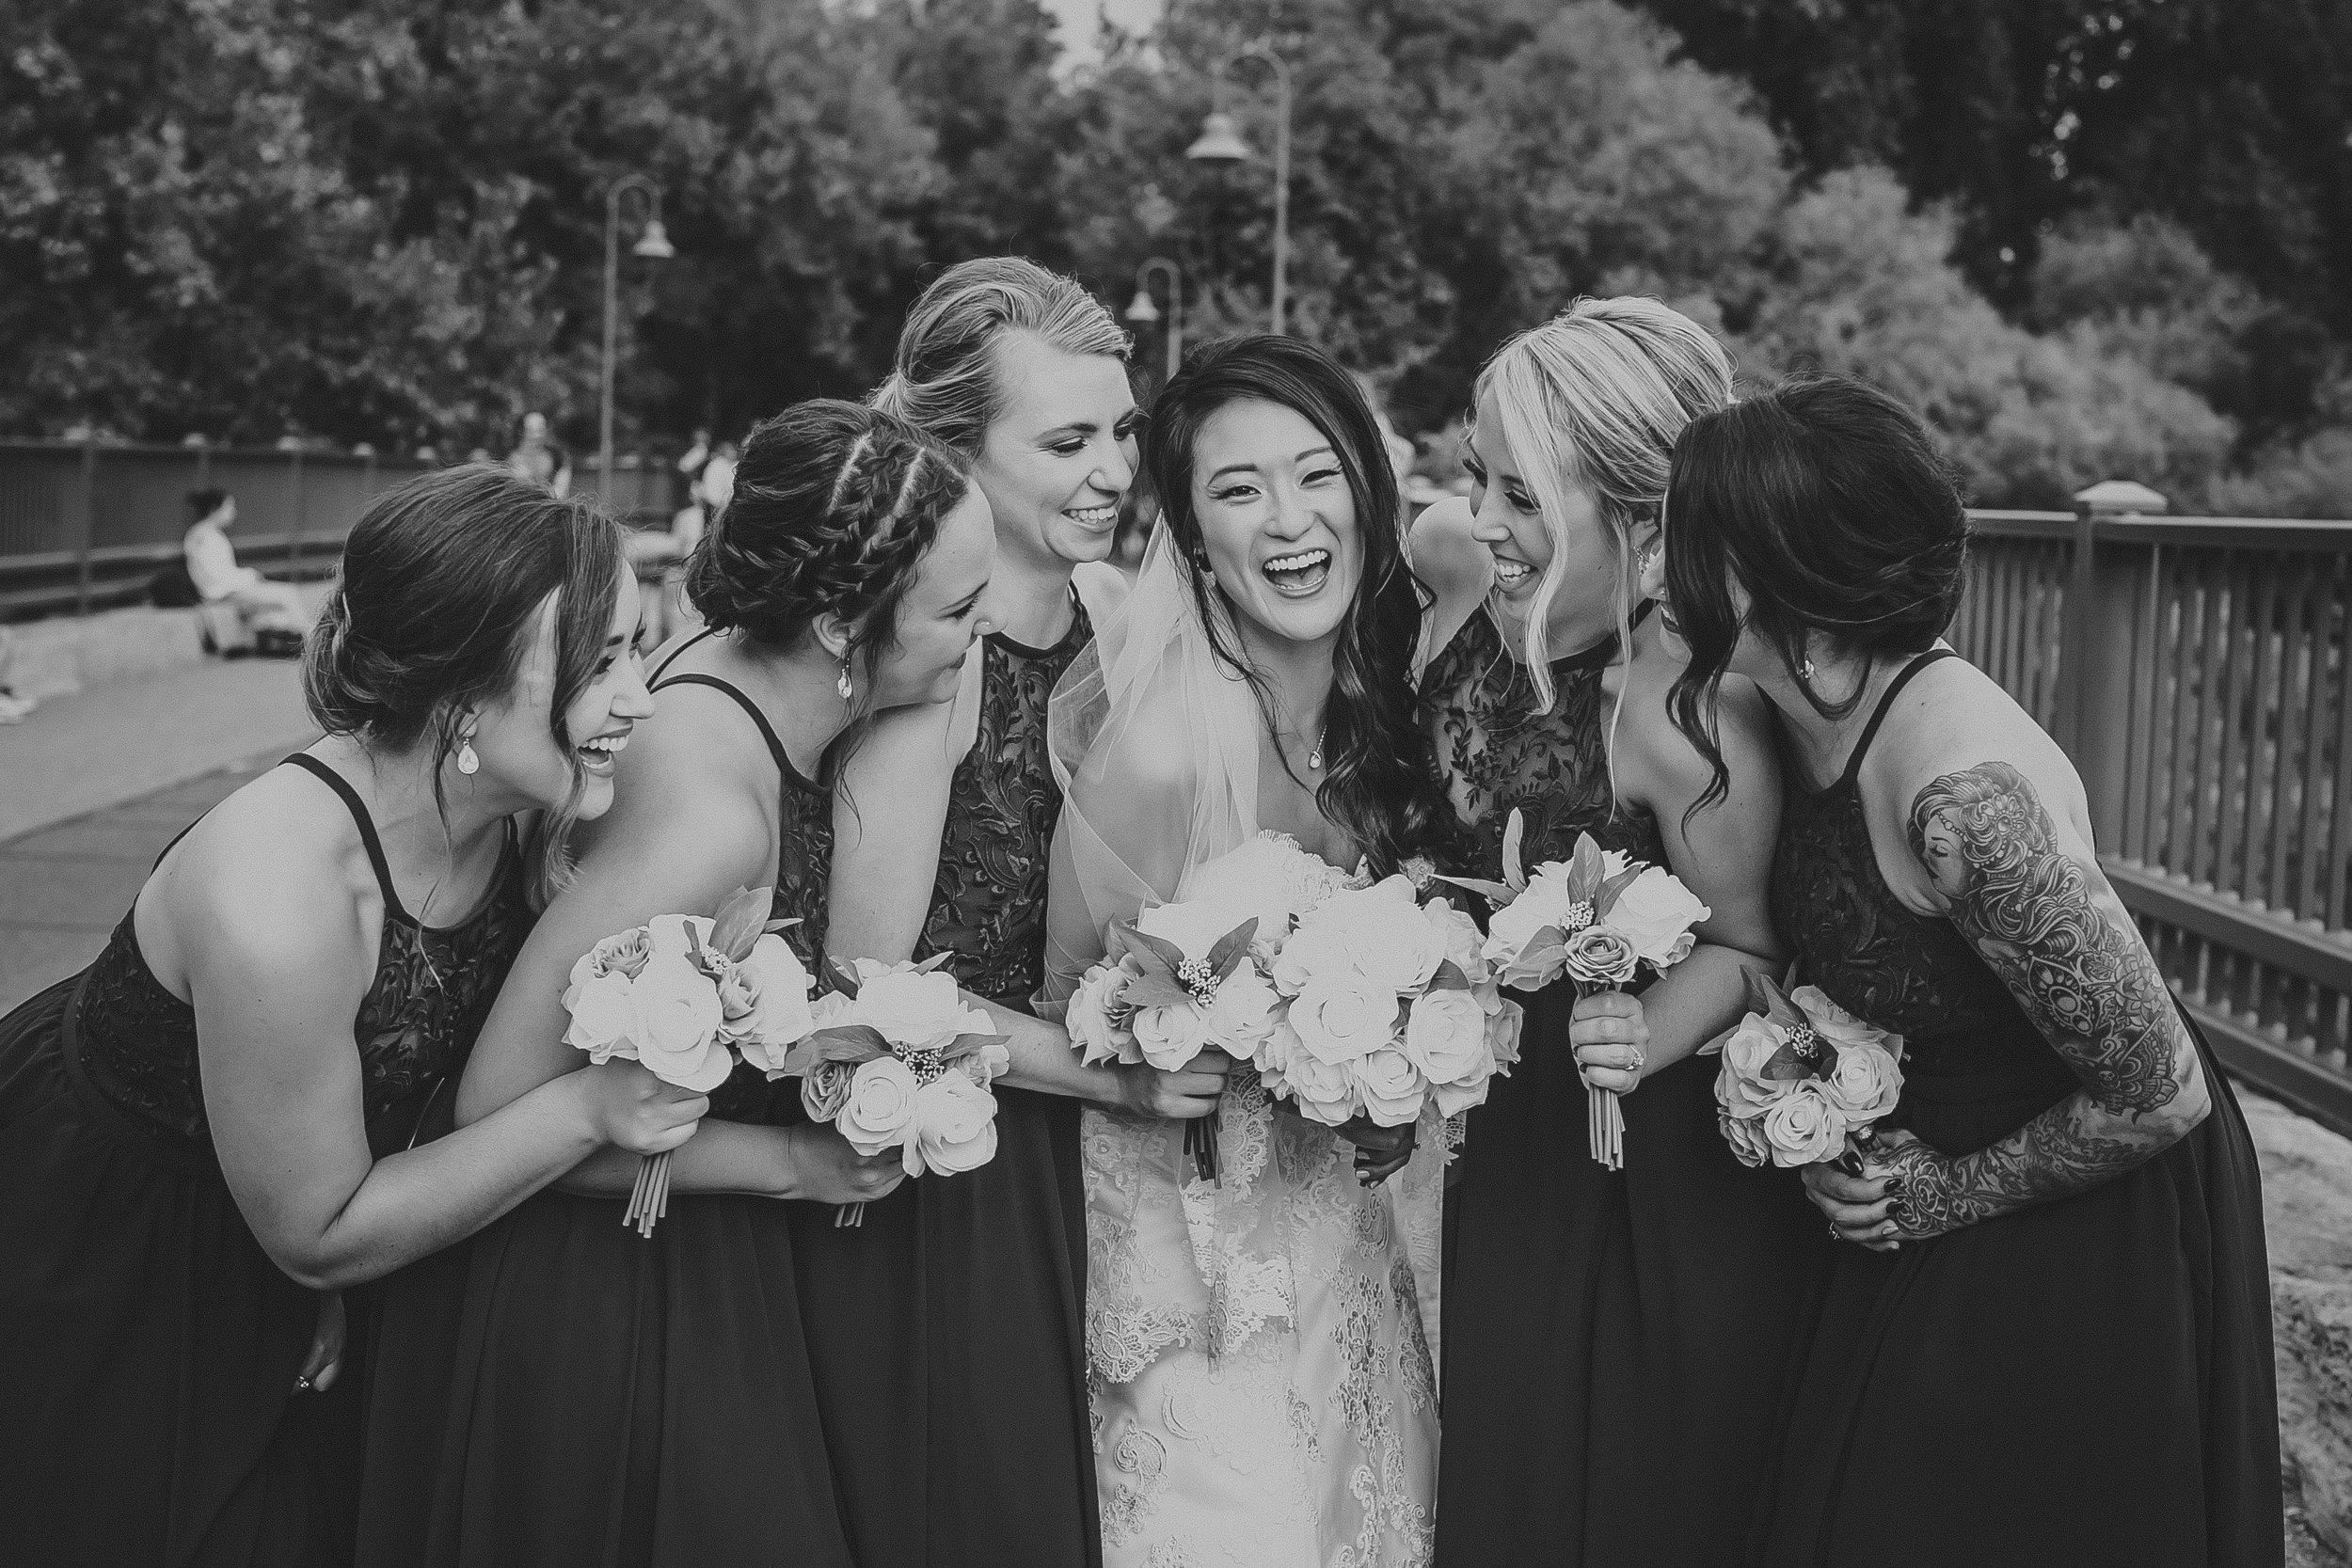 Wedding up-dos by Vizi Staff